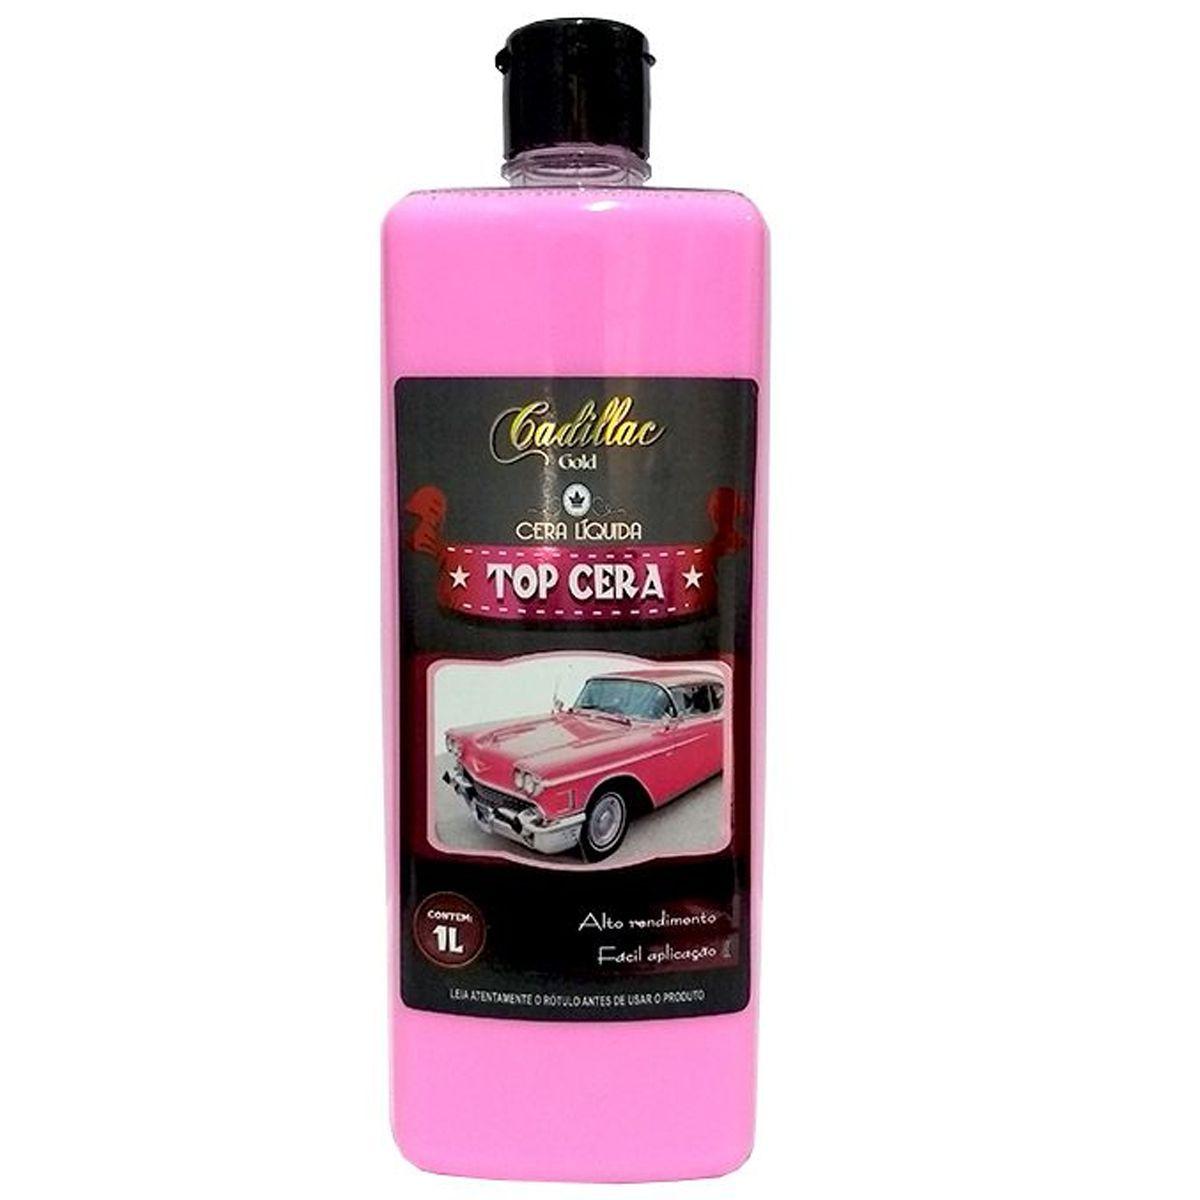 Kit Top Cera 1L+ Aromatizante Carro Novo 5L